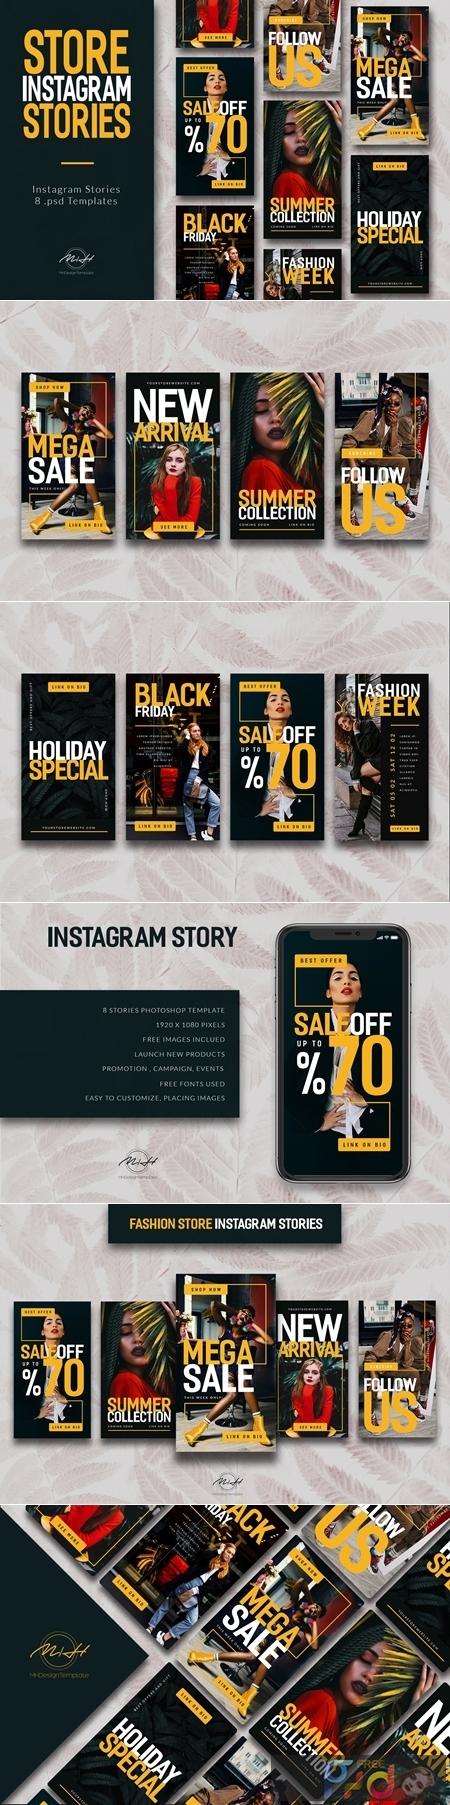 Fashion Instagram Stories Template 3829057 1